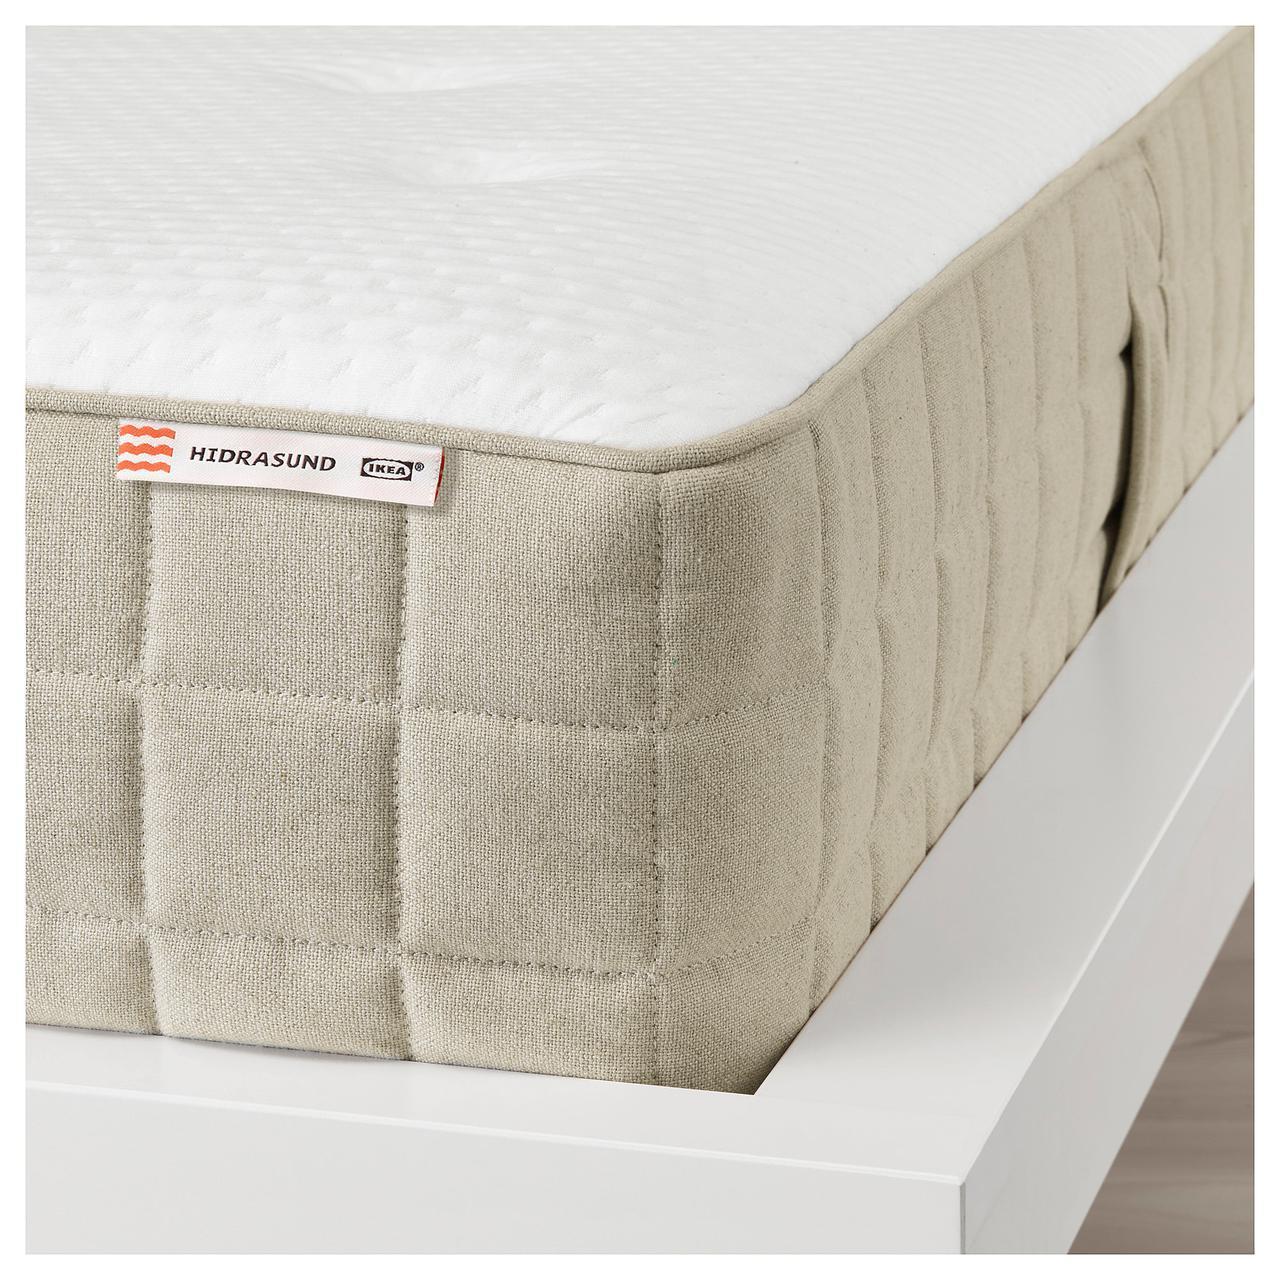 IKEA HIDRASUND (003.726.94) Матрац, матрас с пружинами карманного типа, натуральный